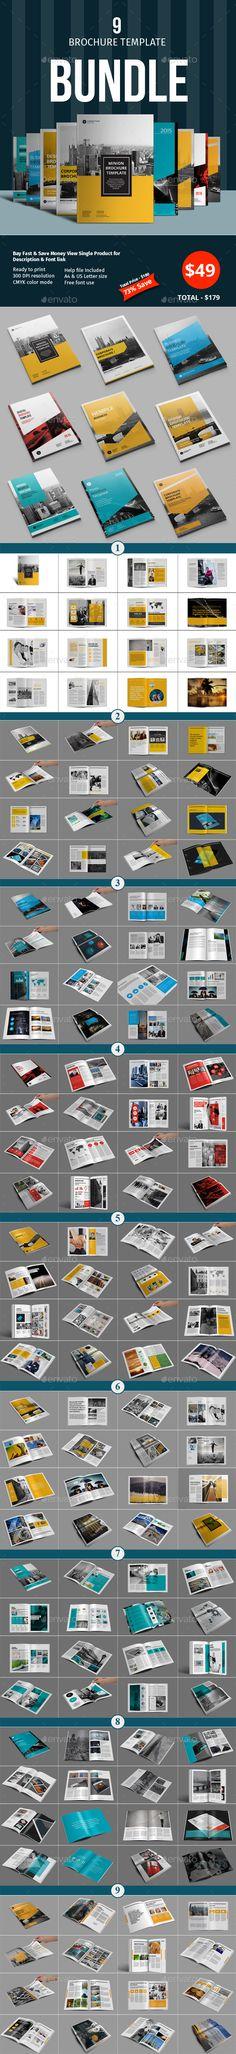 #Brochure #Template #Bundle - Corporate Brochures Download here: https://graphicriver.net/item/brochure-template-bundle/18100663?ref=alena994